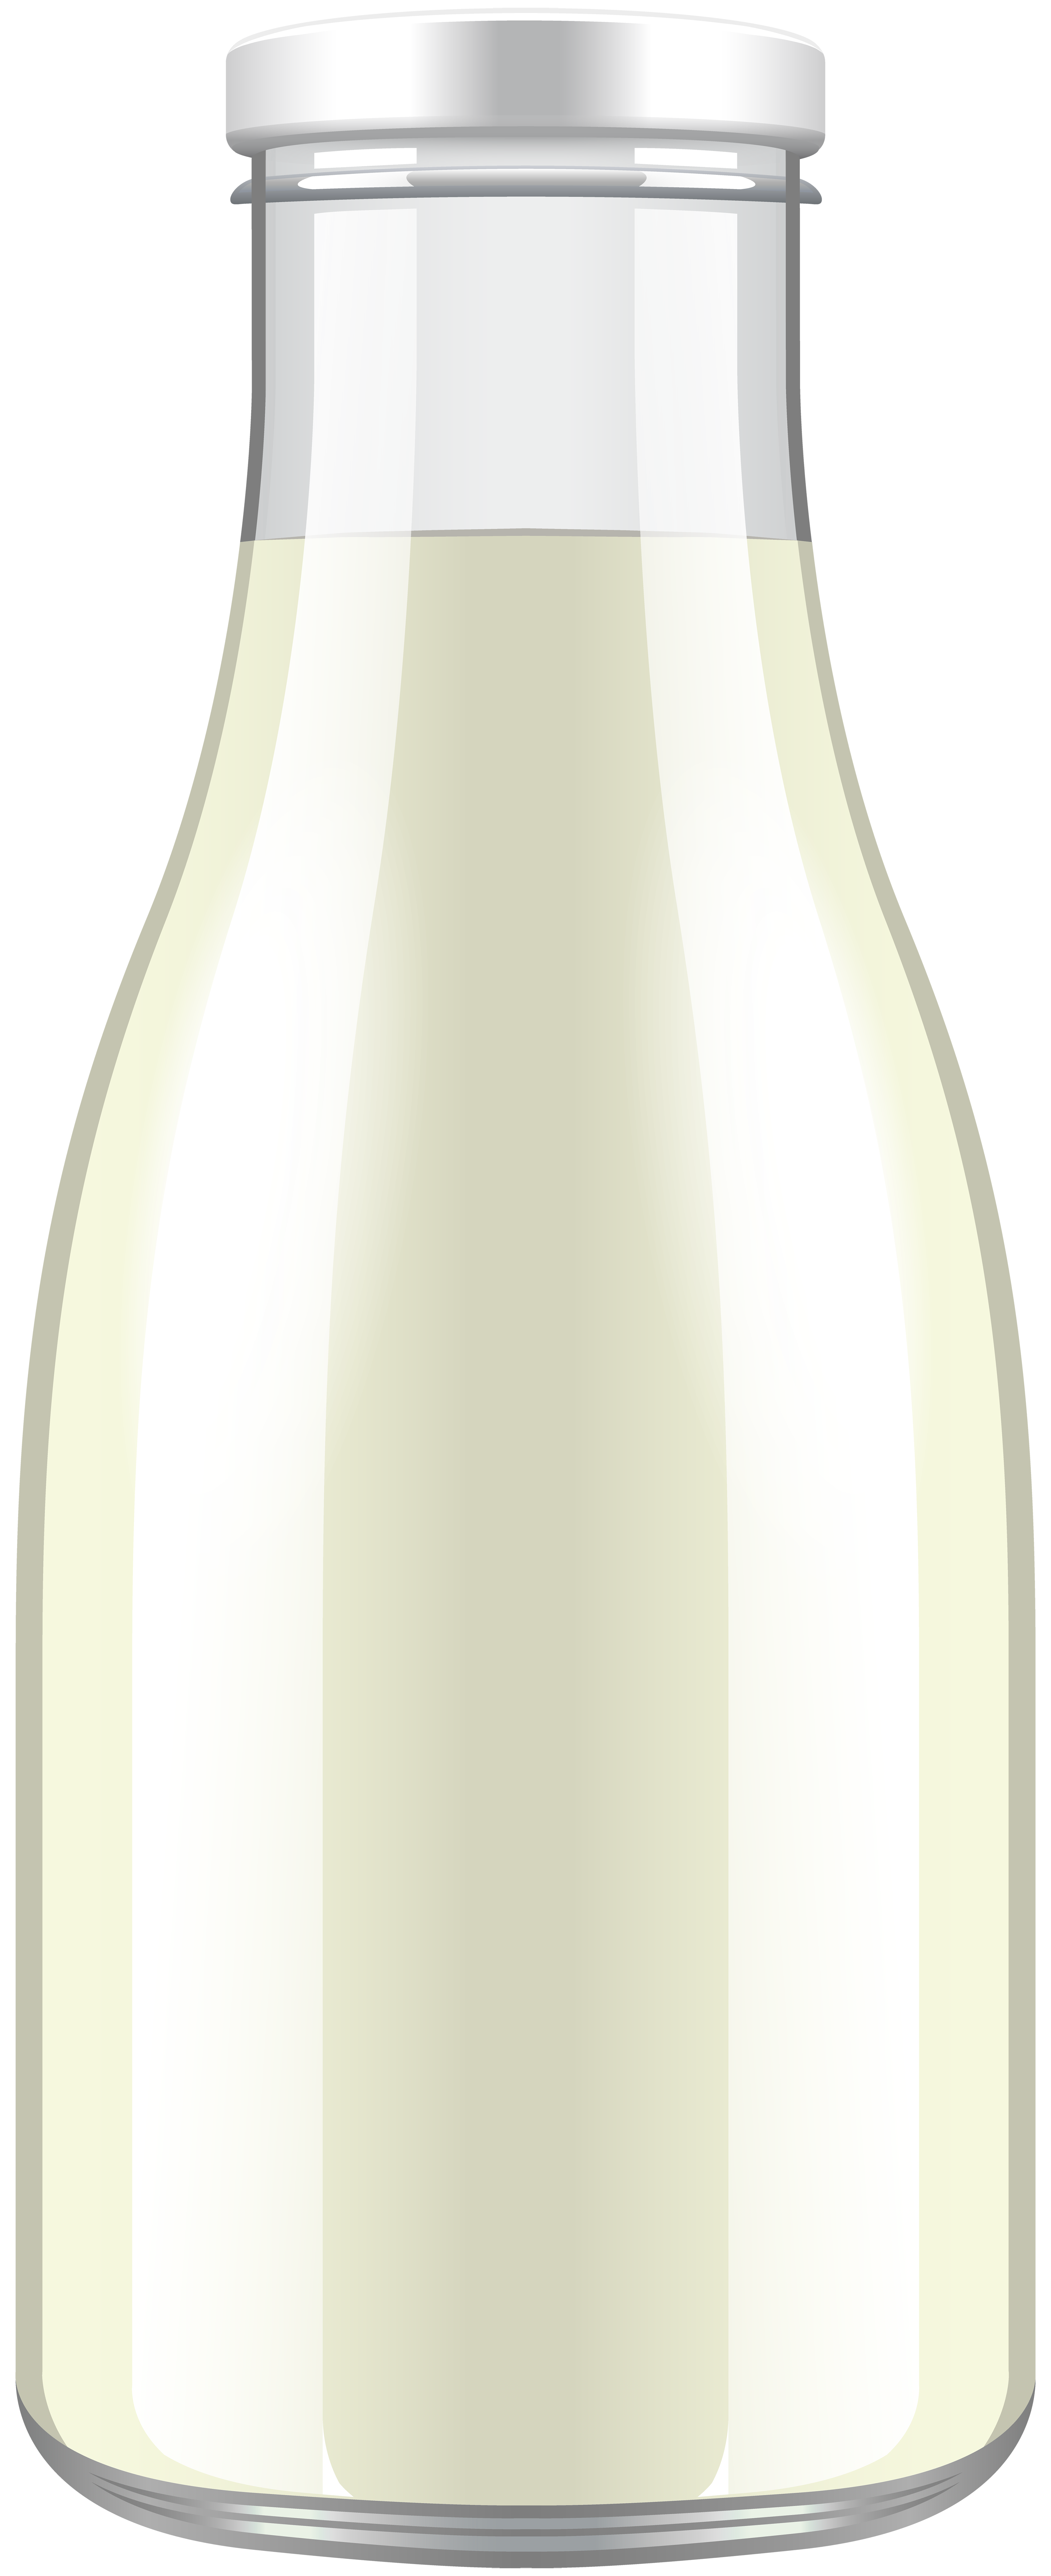 Of png clip art. Bottle clipart milk bottle